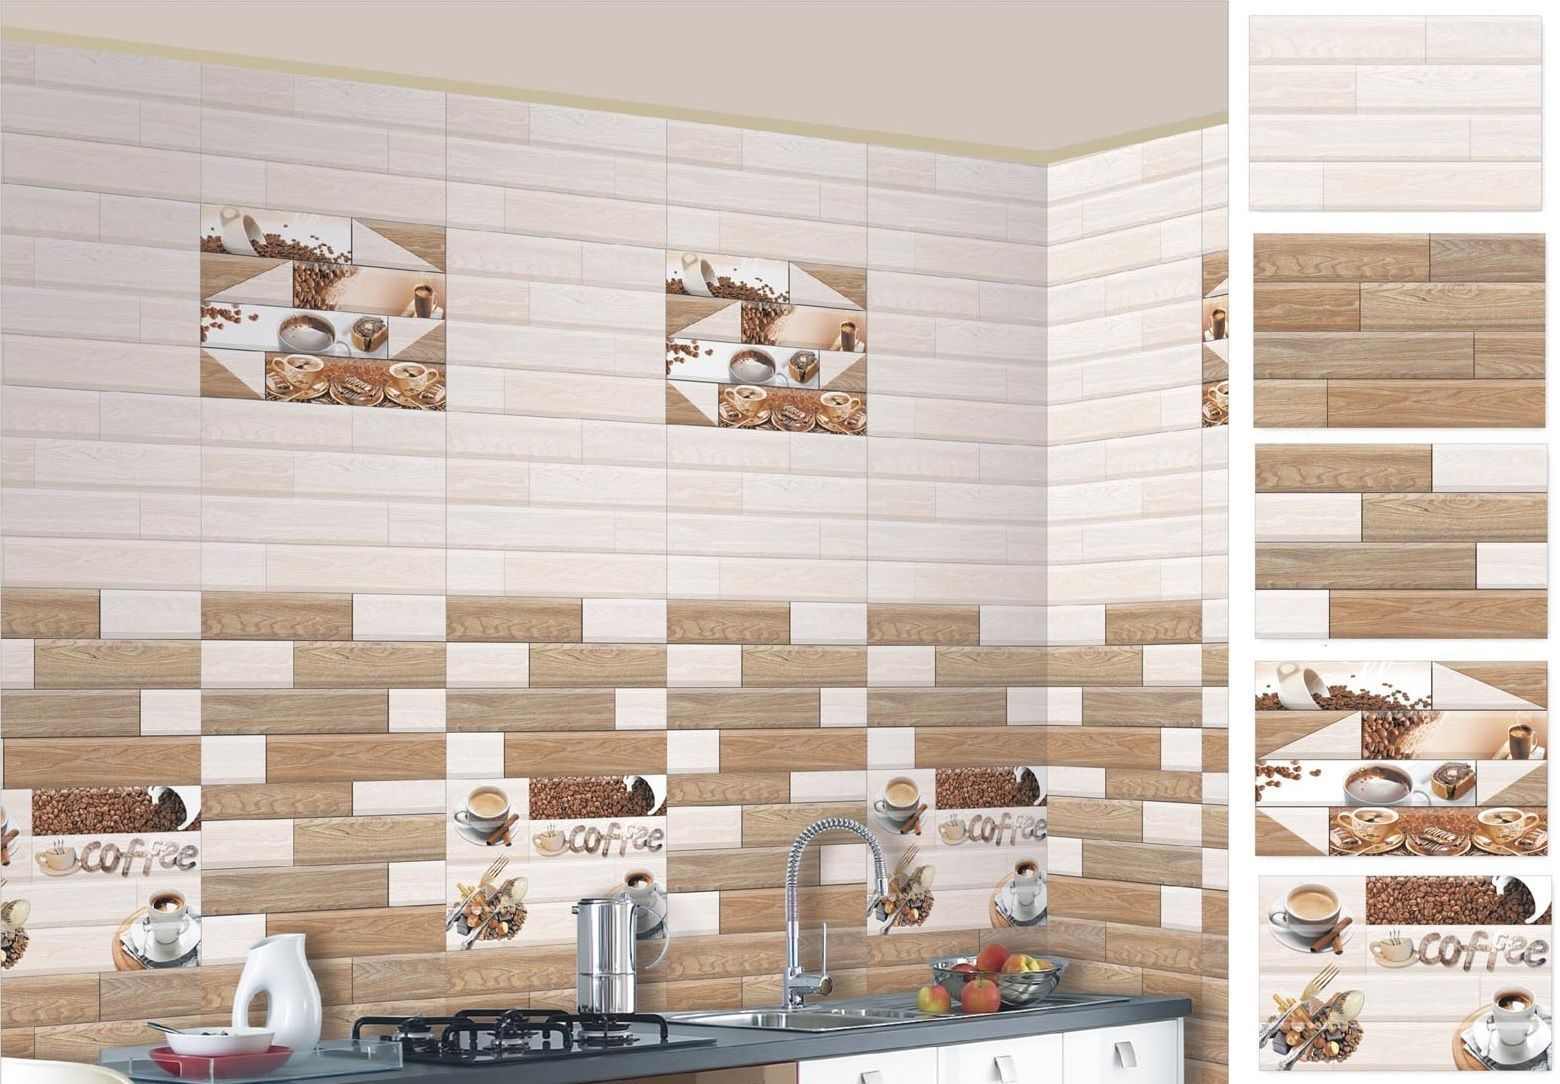 Johnson Kitchen Wall Tiles Catalogue   Kitchen wall tiles, Kitchen ...